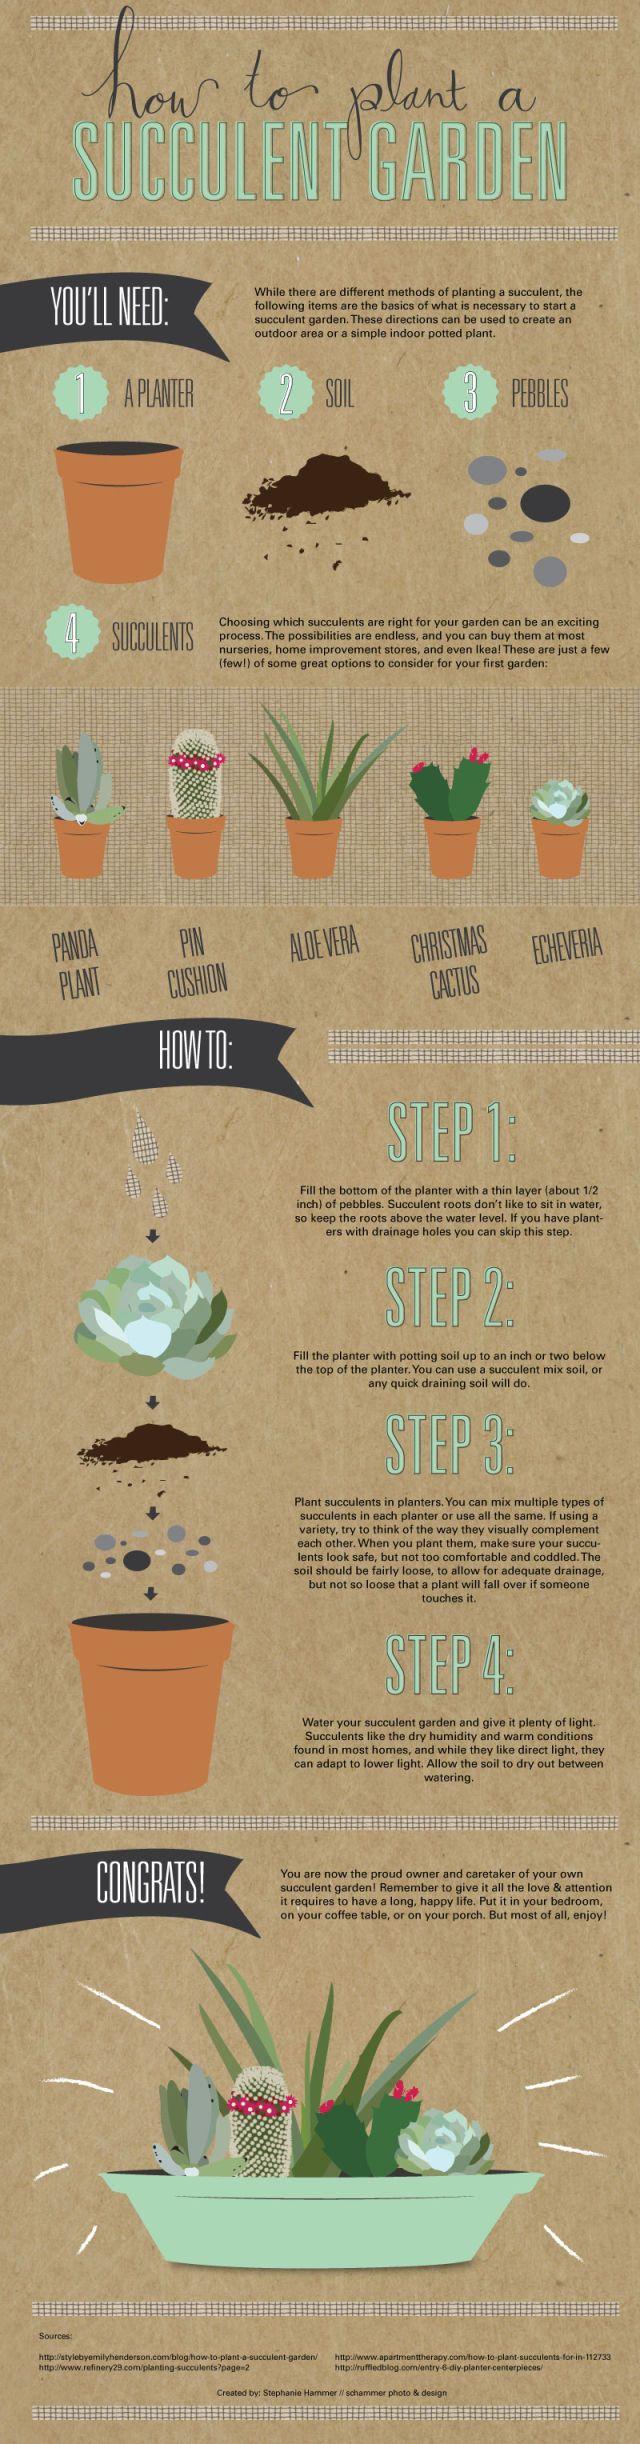 94 best Garden Ideas images on Pinterest | Vegetable garden ...